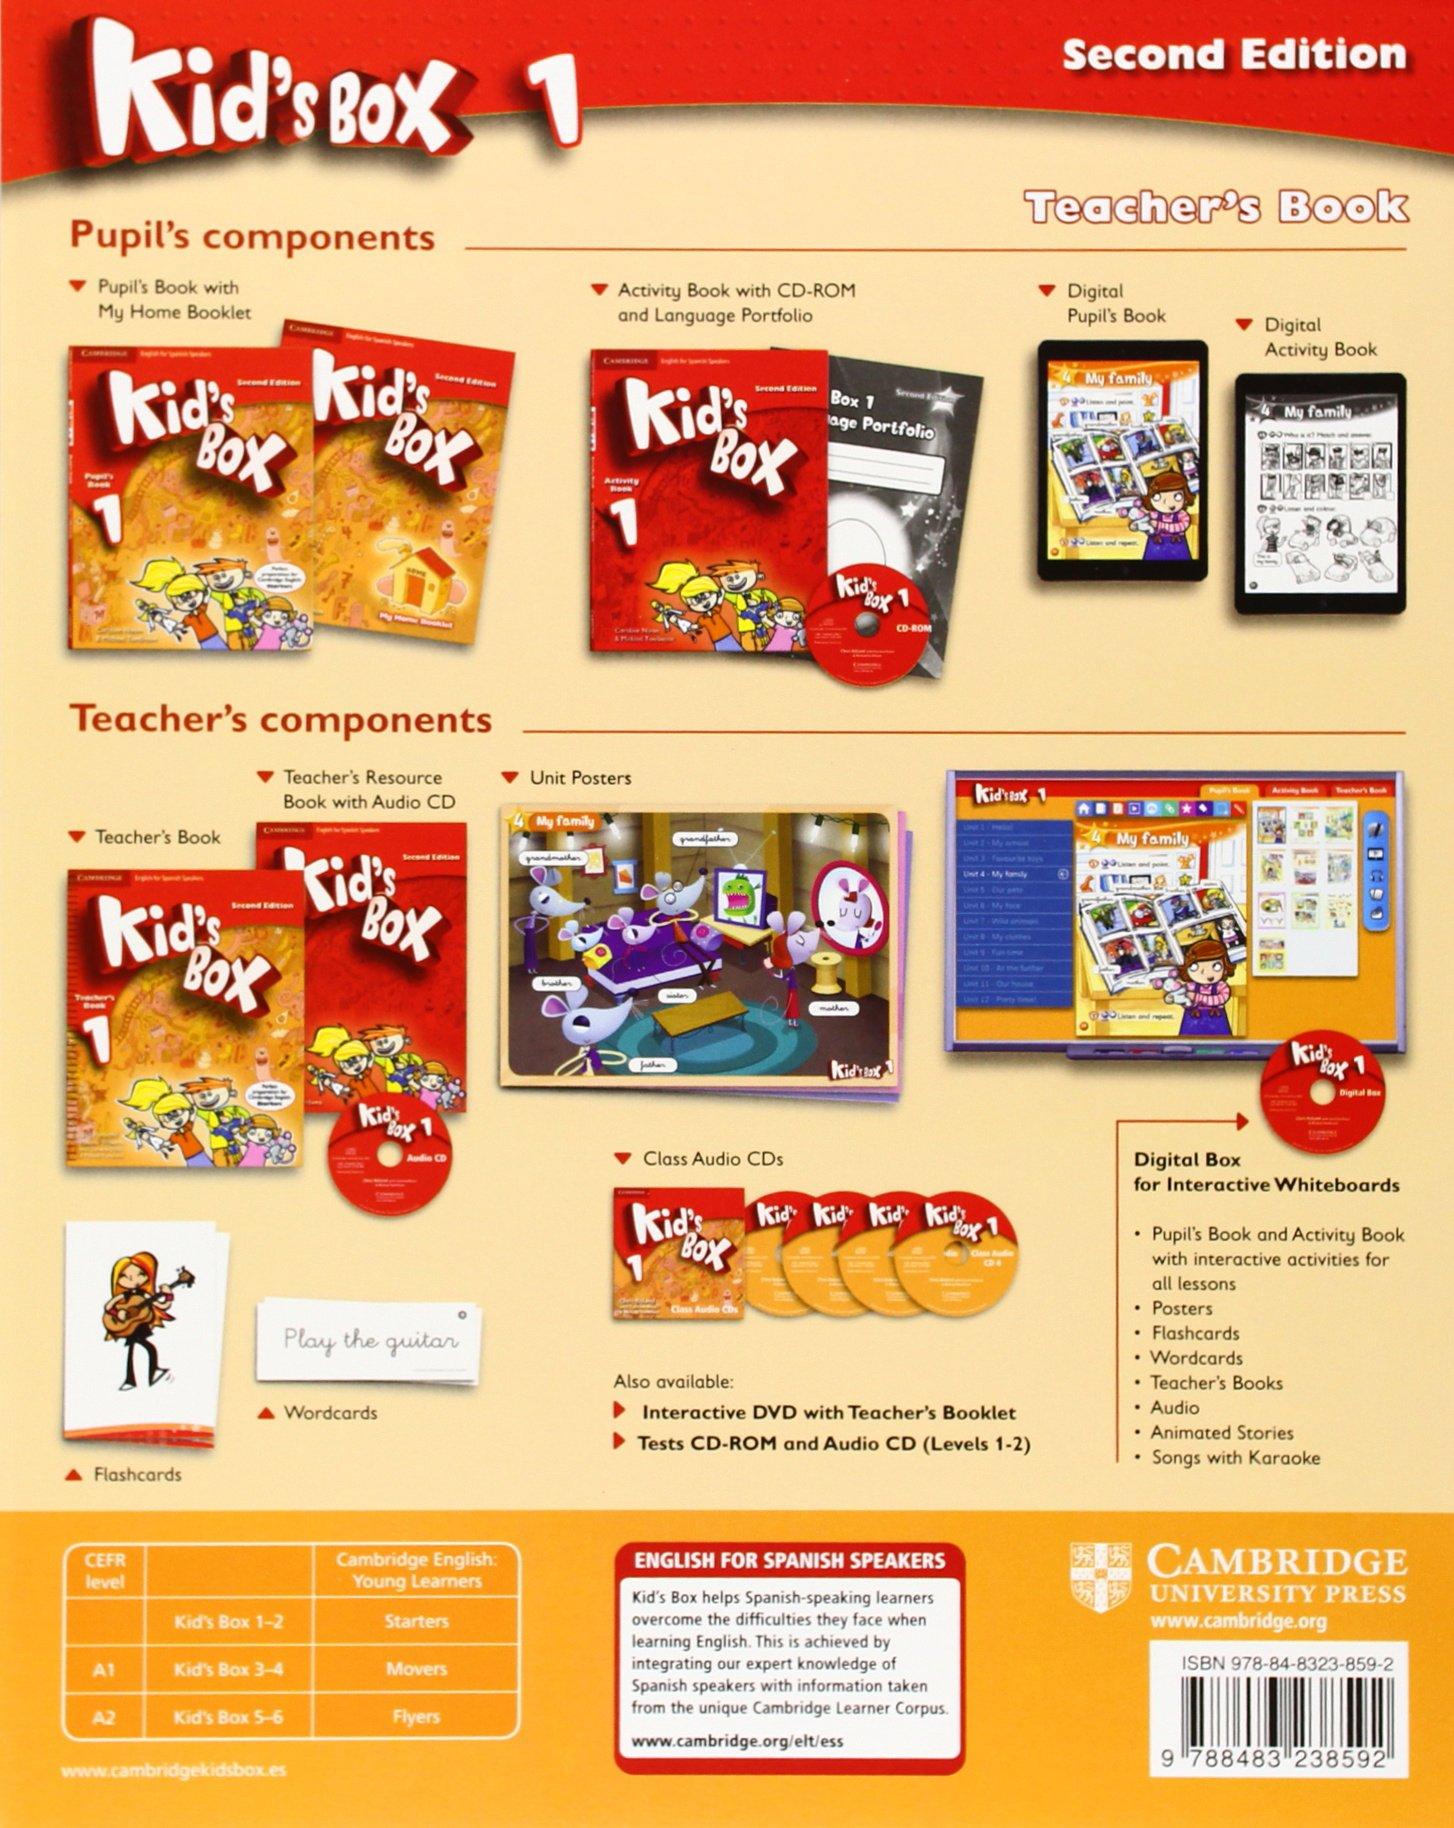 Kid's Box for Spanish Speakers Level 1 Teacher's Book Second Edition -  9788483238592: Amazon.es: Lucy Frino, Melanie Williams, Caroline Nixon, ...